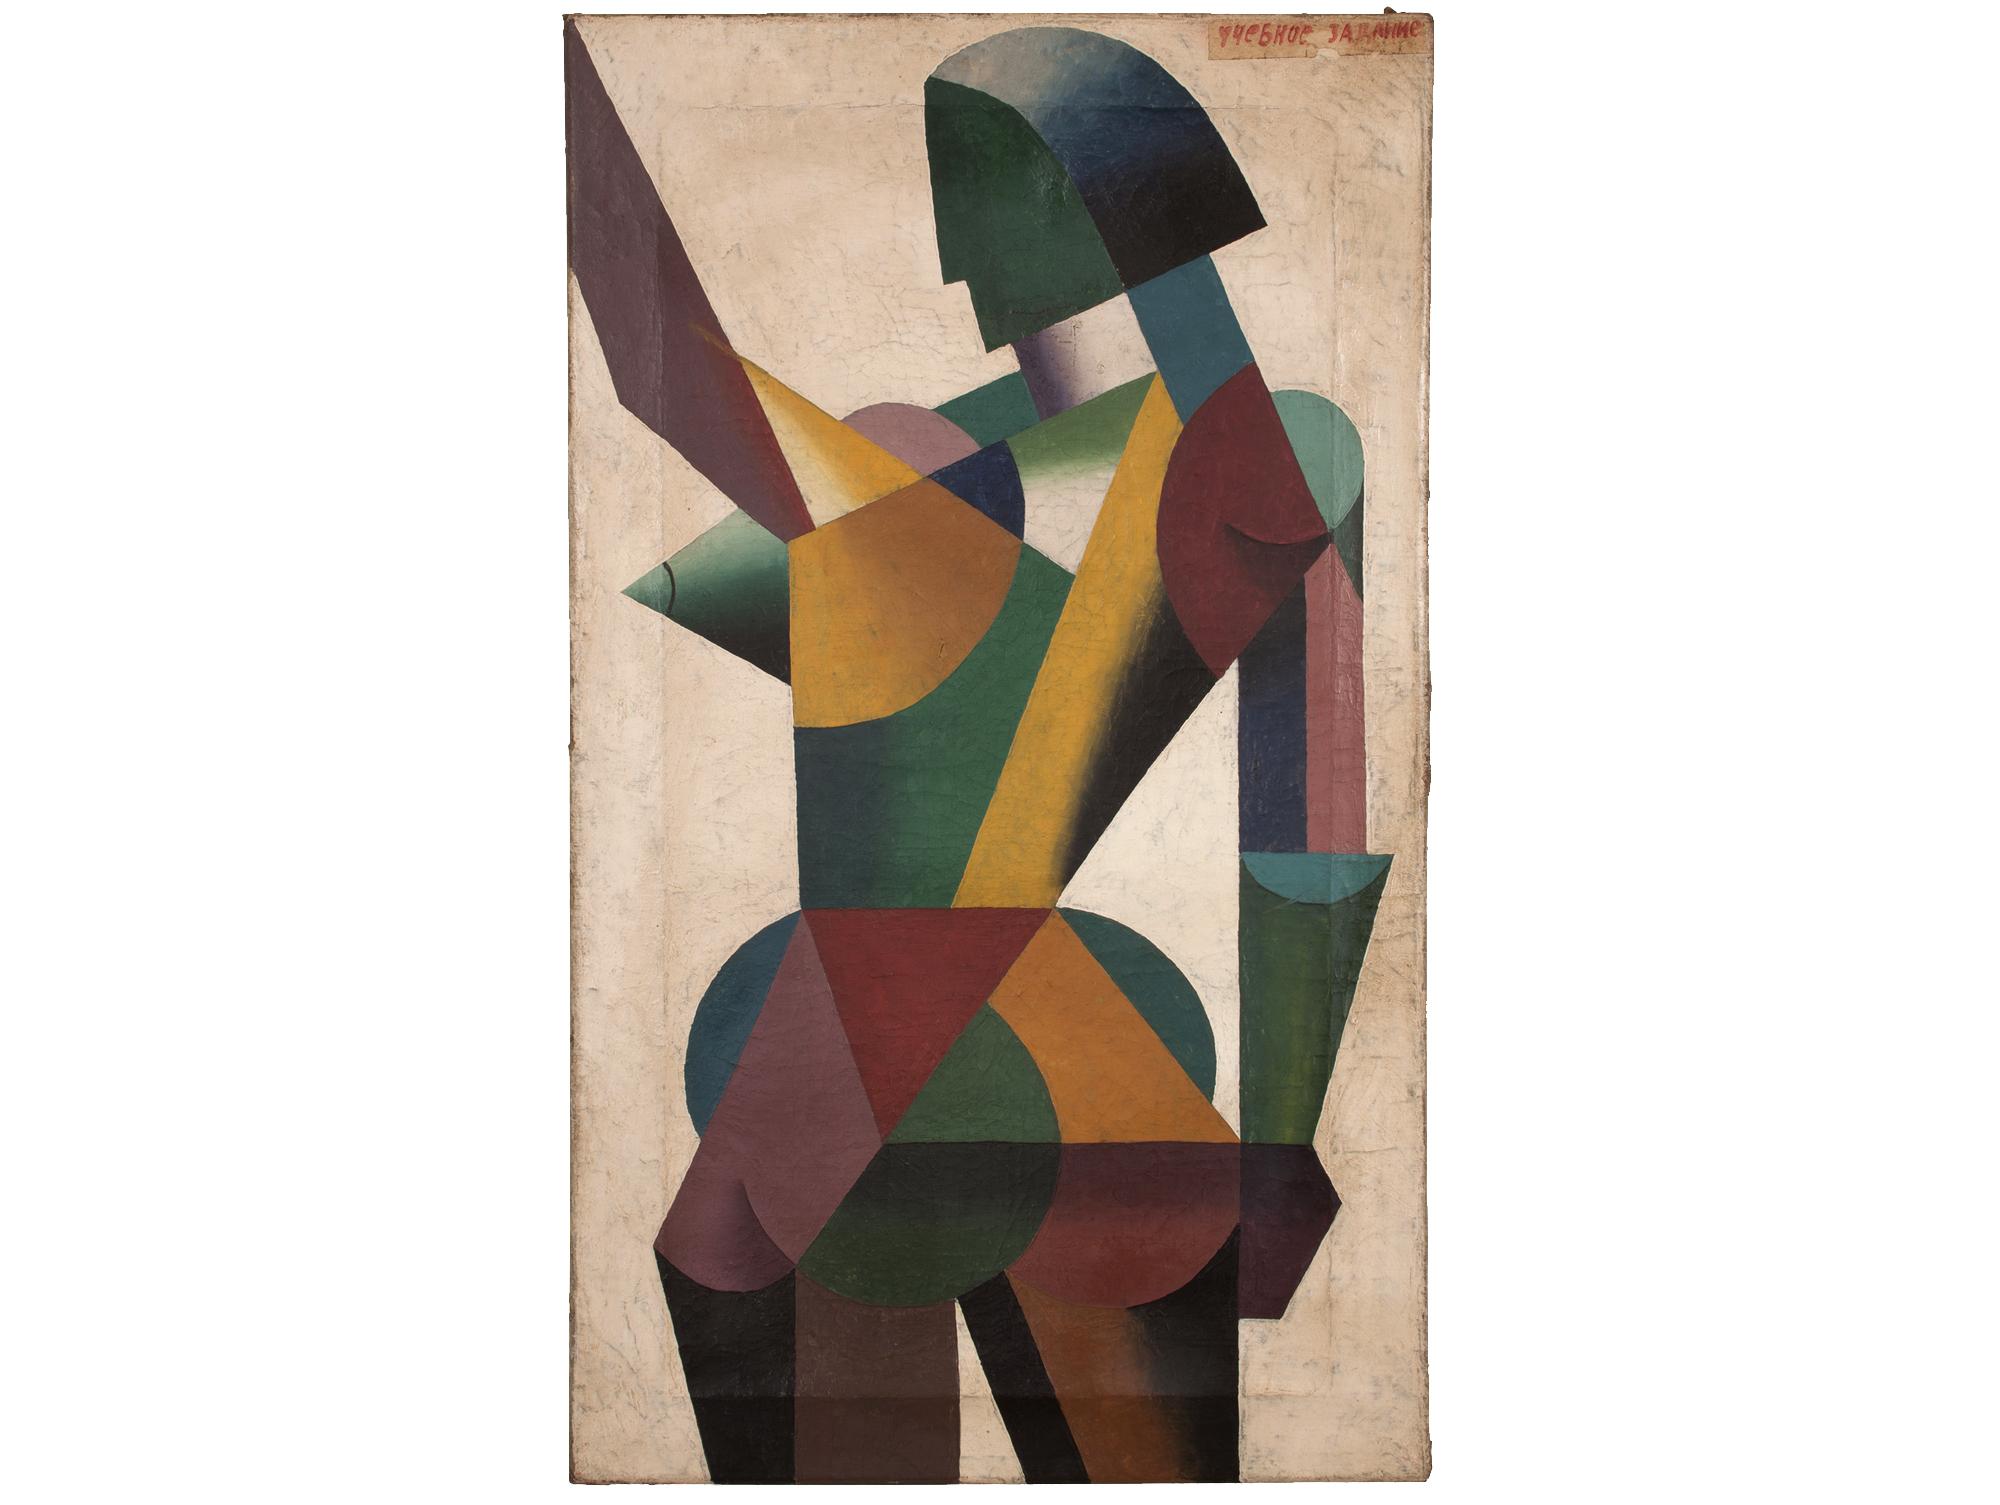 Unattributed. Unsigned. In the style of Lyubov Popova.    Oil on Canvas. 63 x 38 cm.